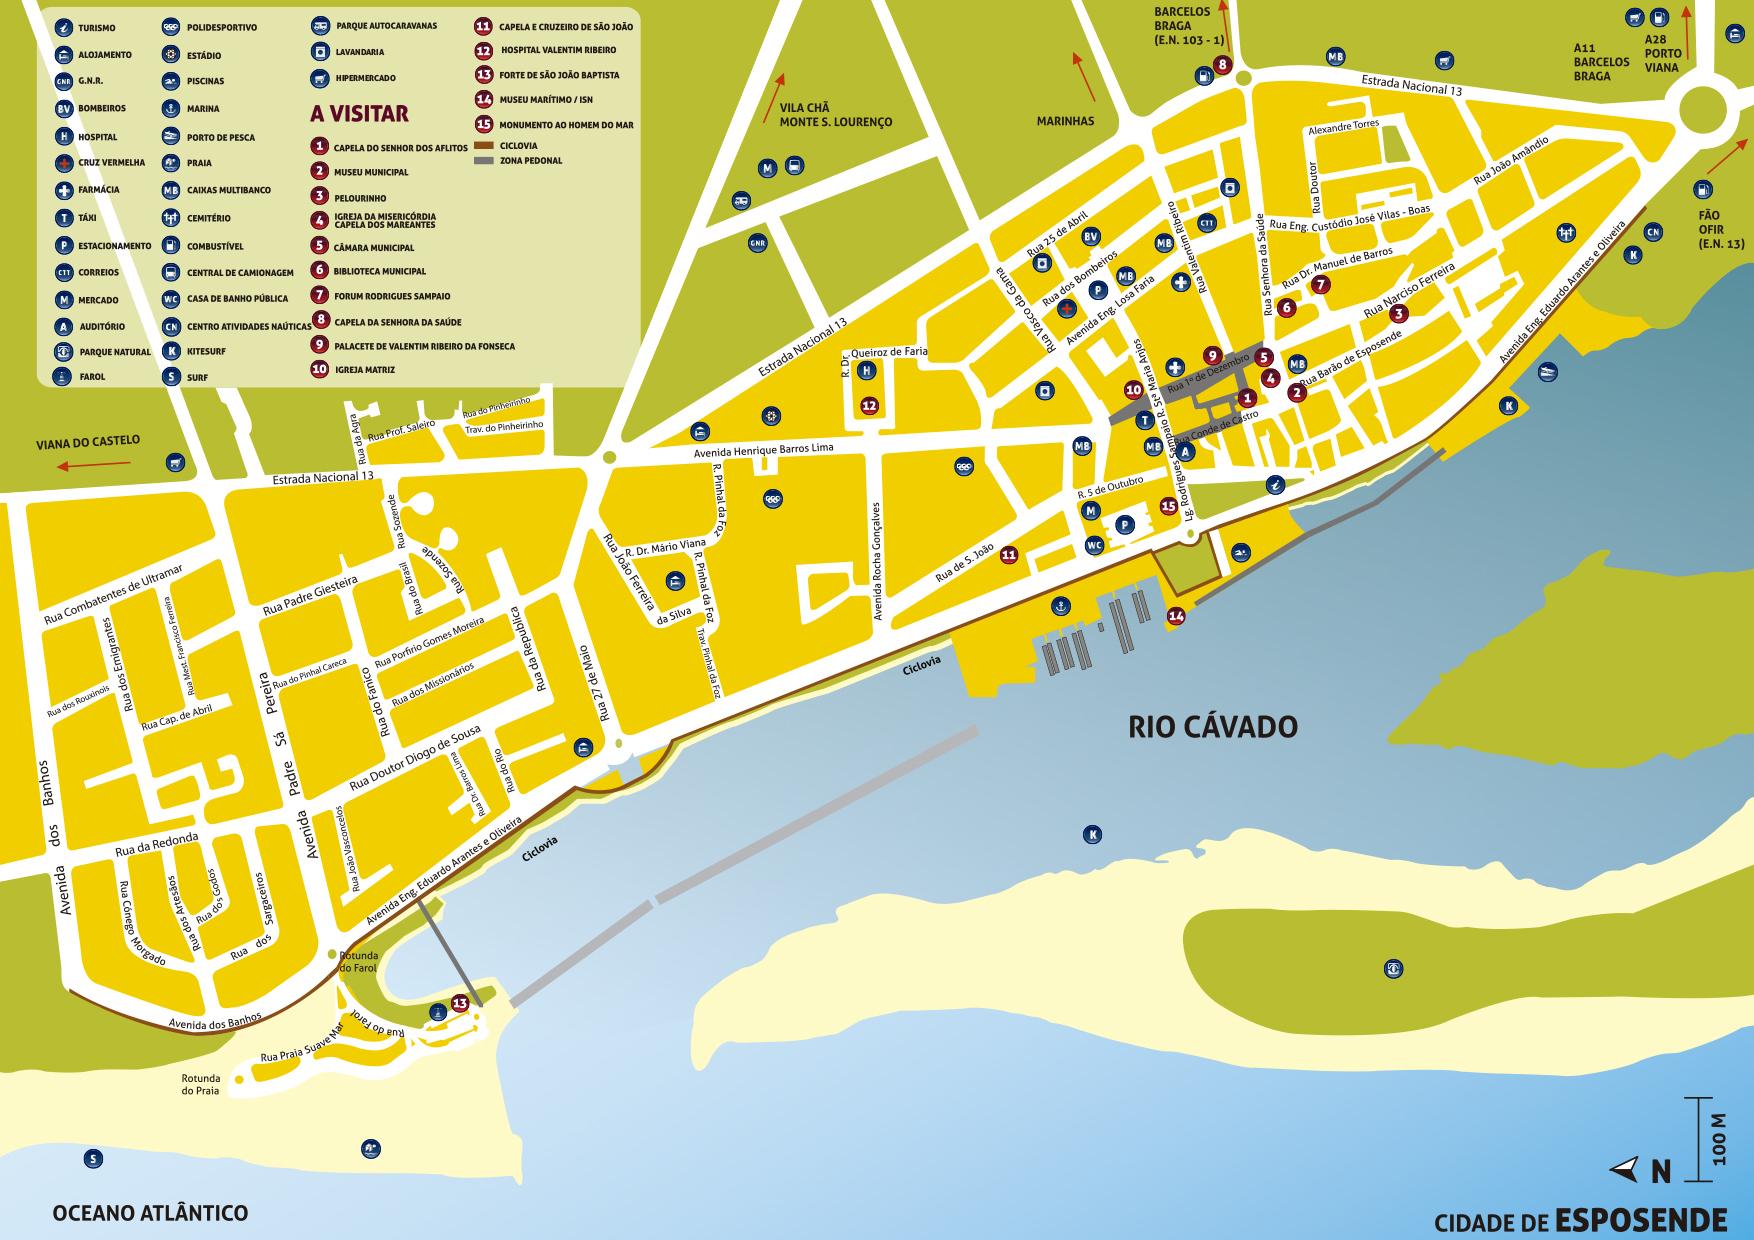 esposende mapa portugal Visite Esposende   Downloads esposende mapa portugal